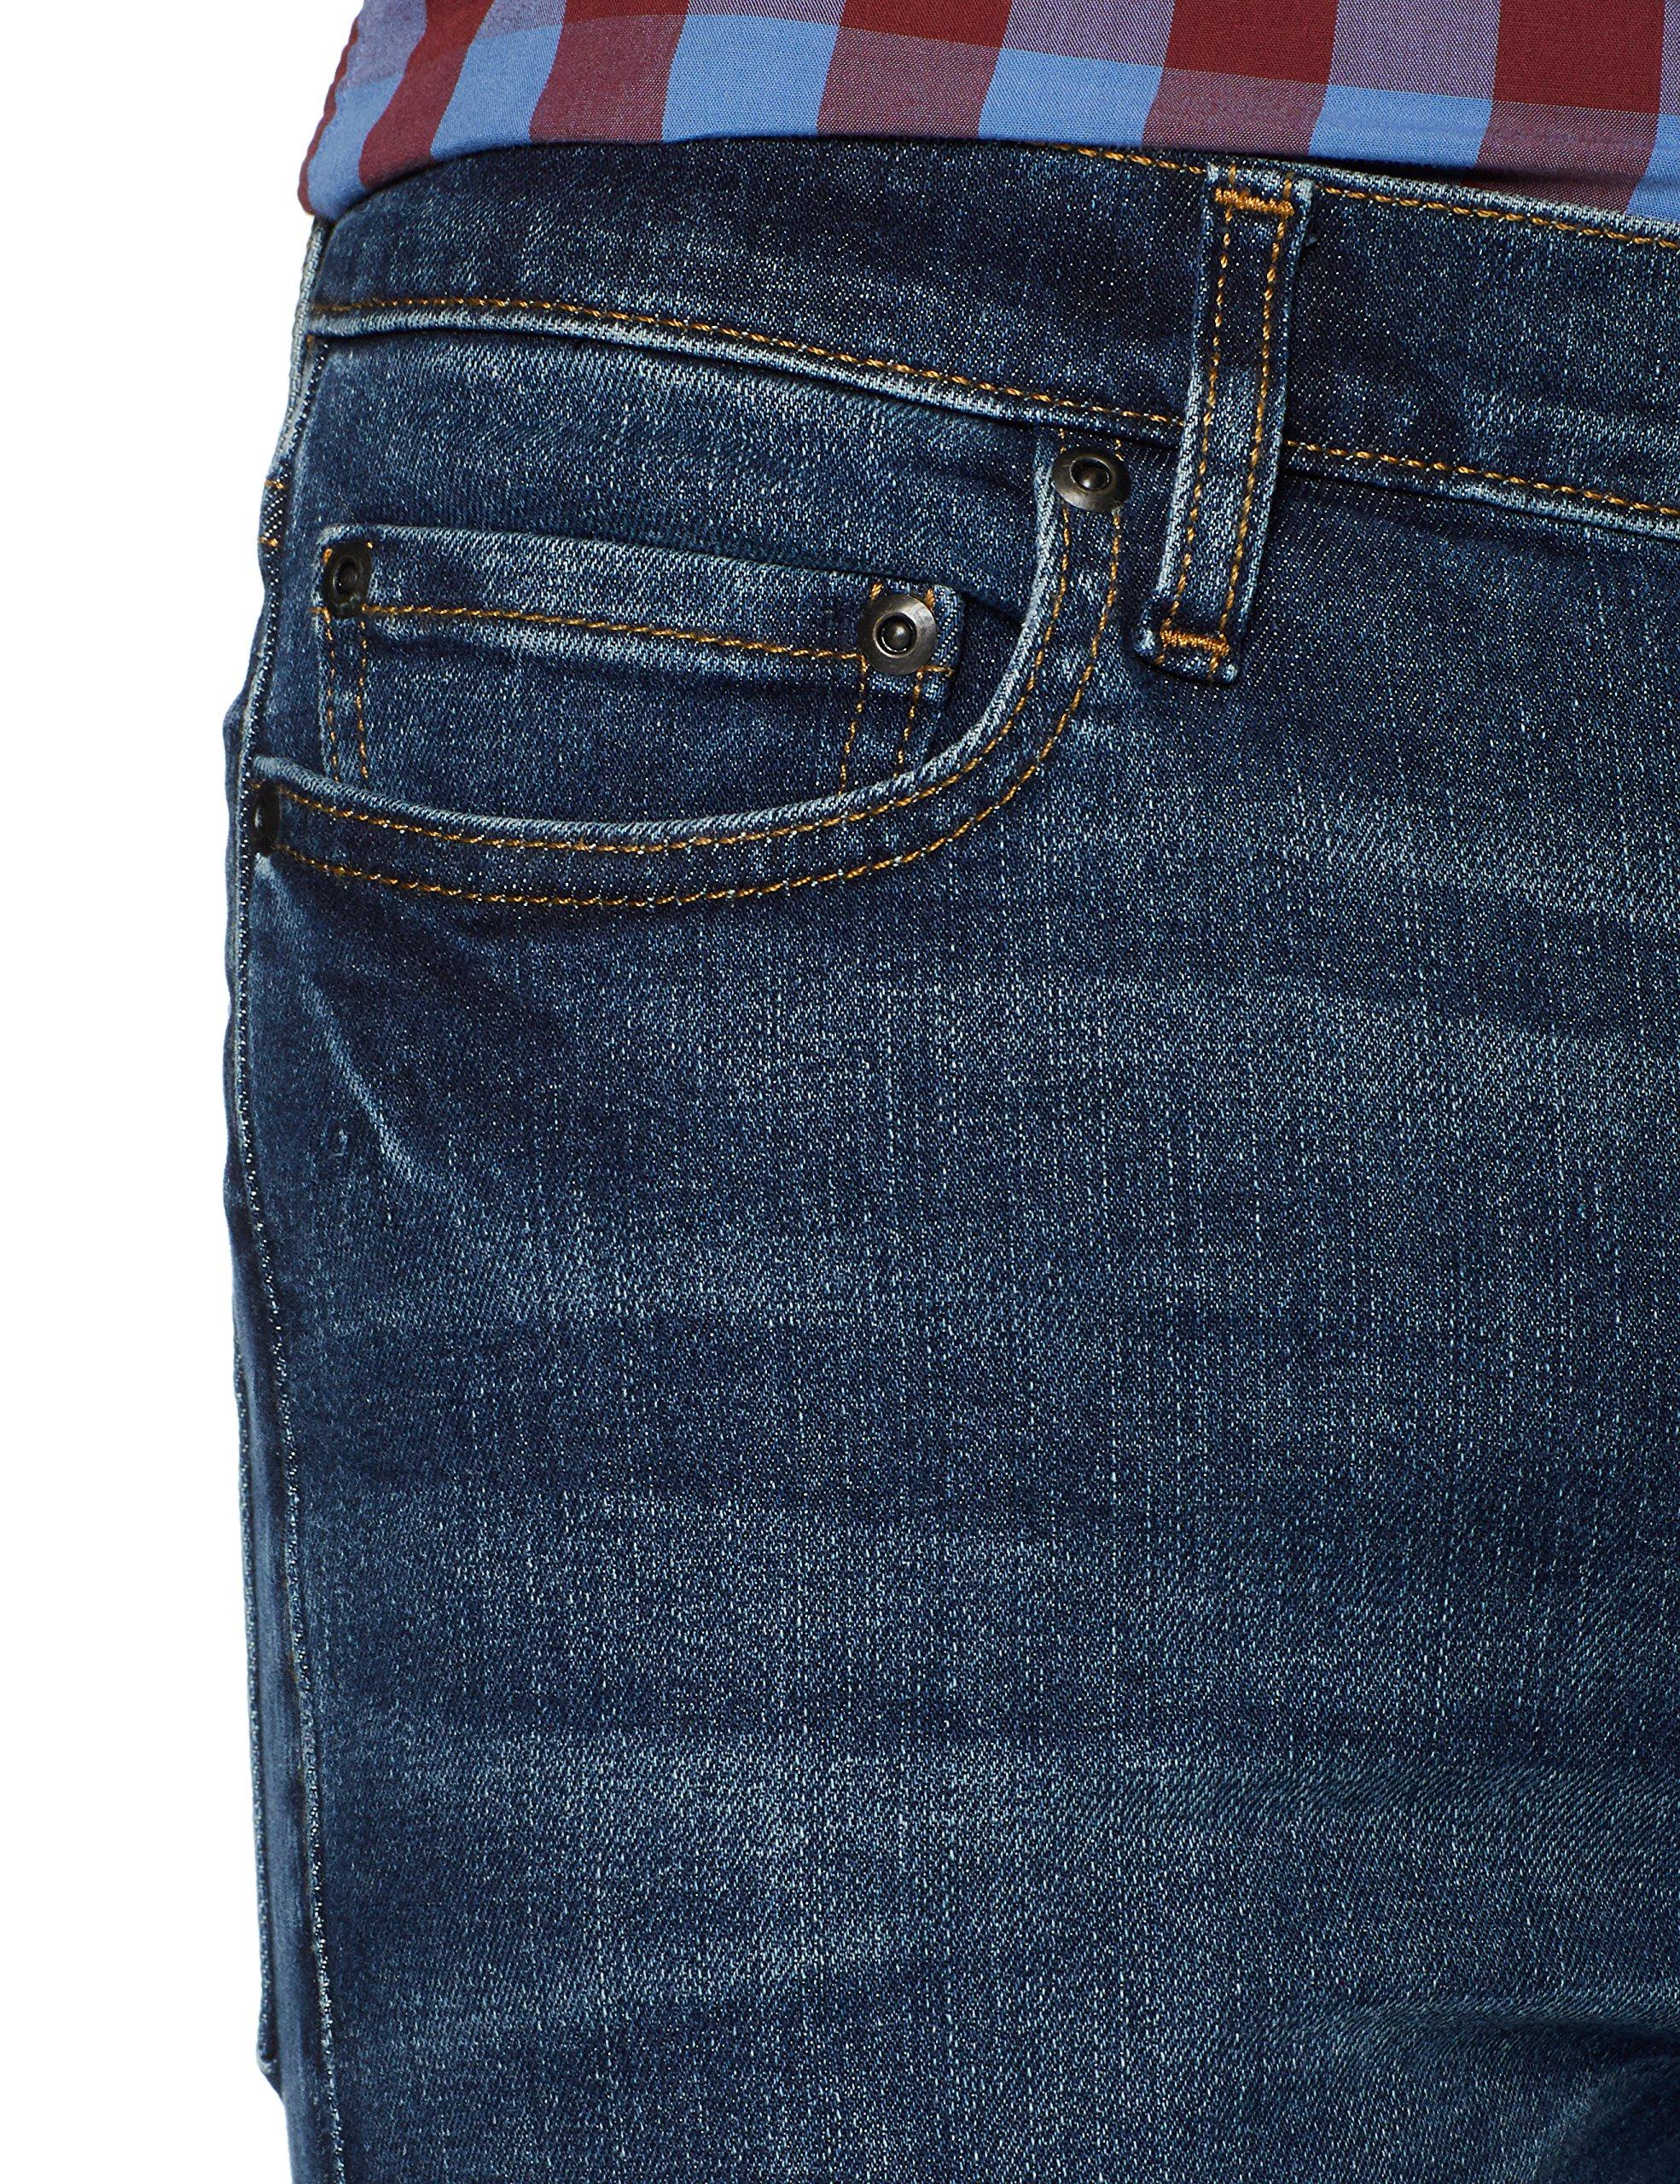 Goodthreads Men's Skinny-Fit Jean, Medium Blue, 38W x 34L by Goodthreads (Image #5)